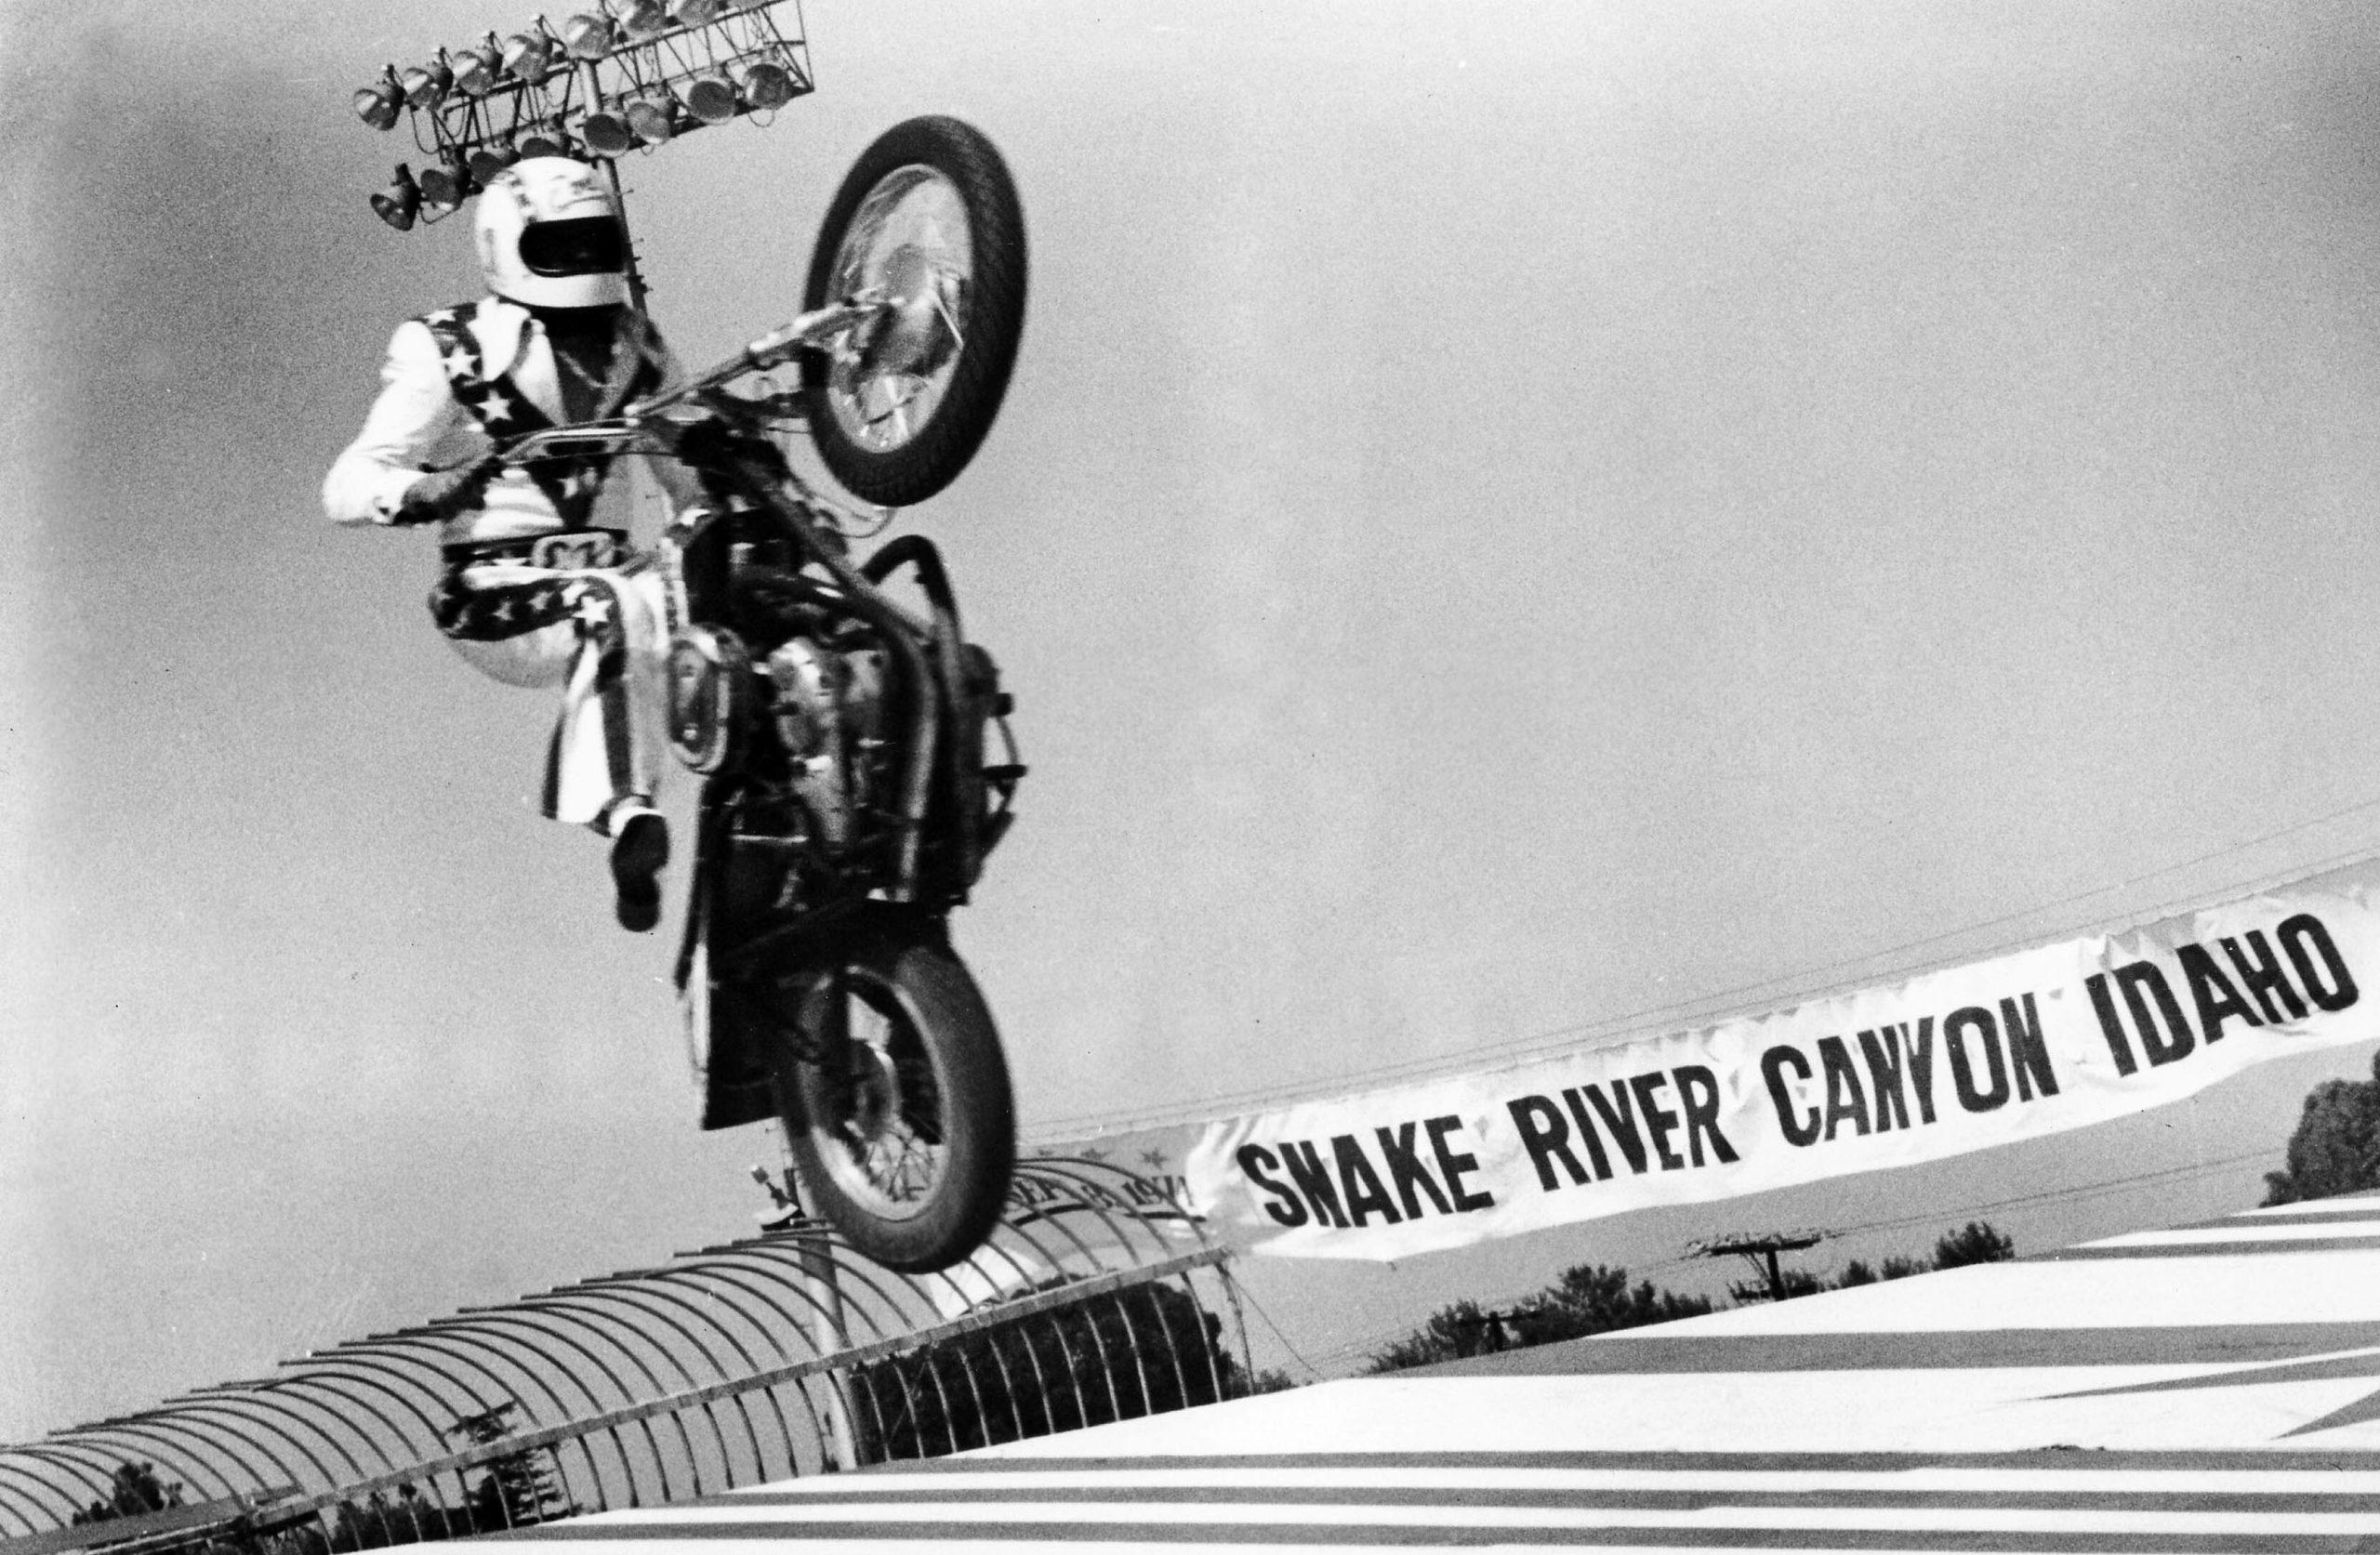 Evel Empire: Knievel's stranglehold on the Seventies